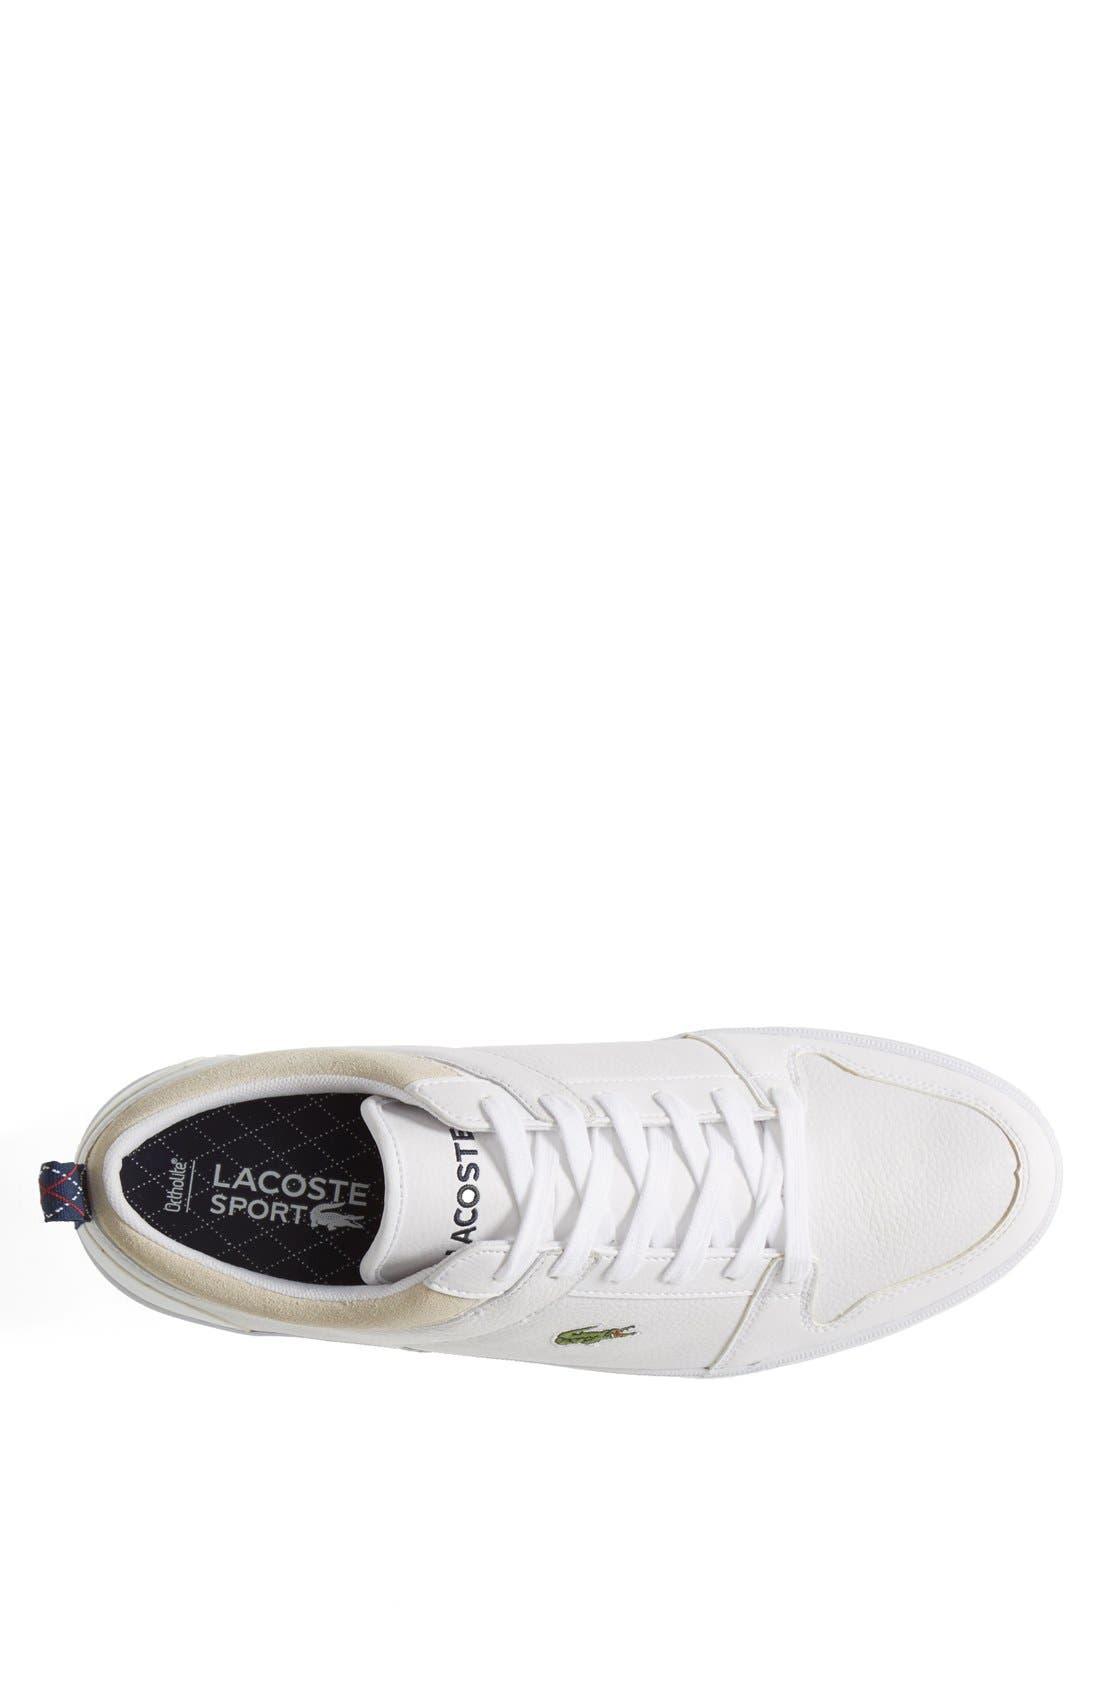 Alternate Image 3  - Lacoste 'Ojetti Mag' Sneaker (Men)